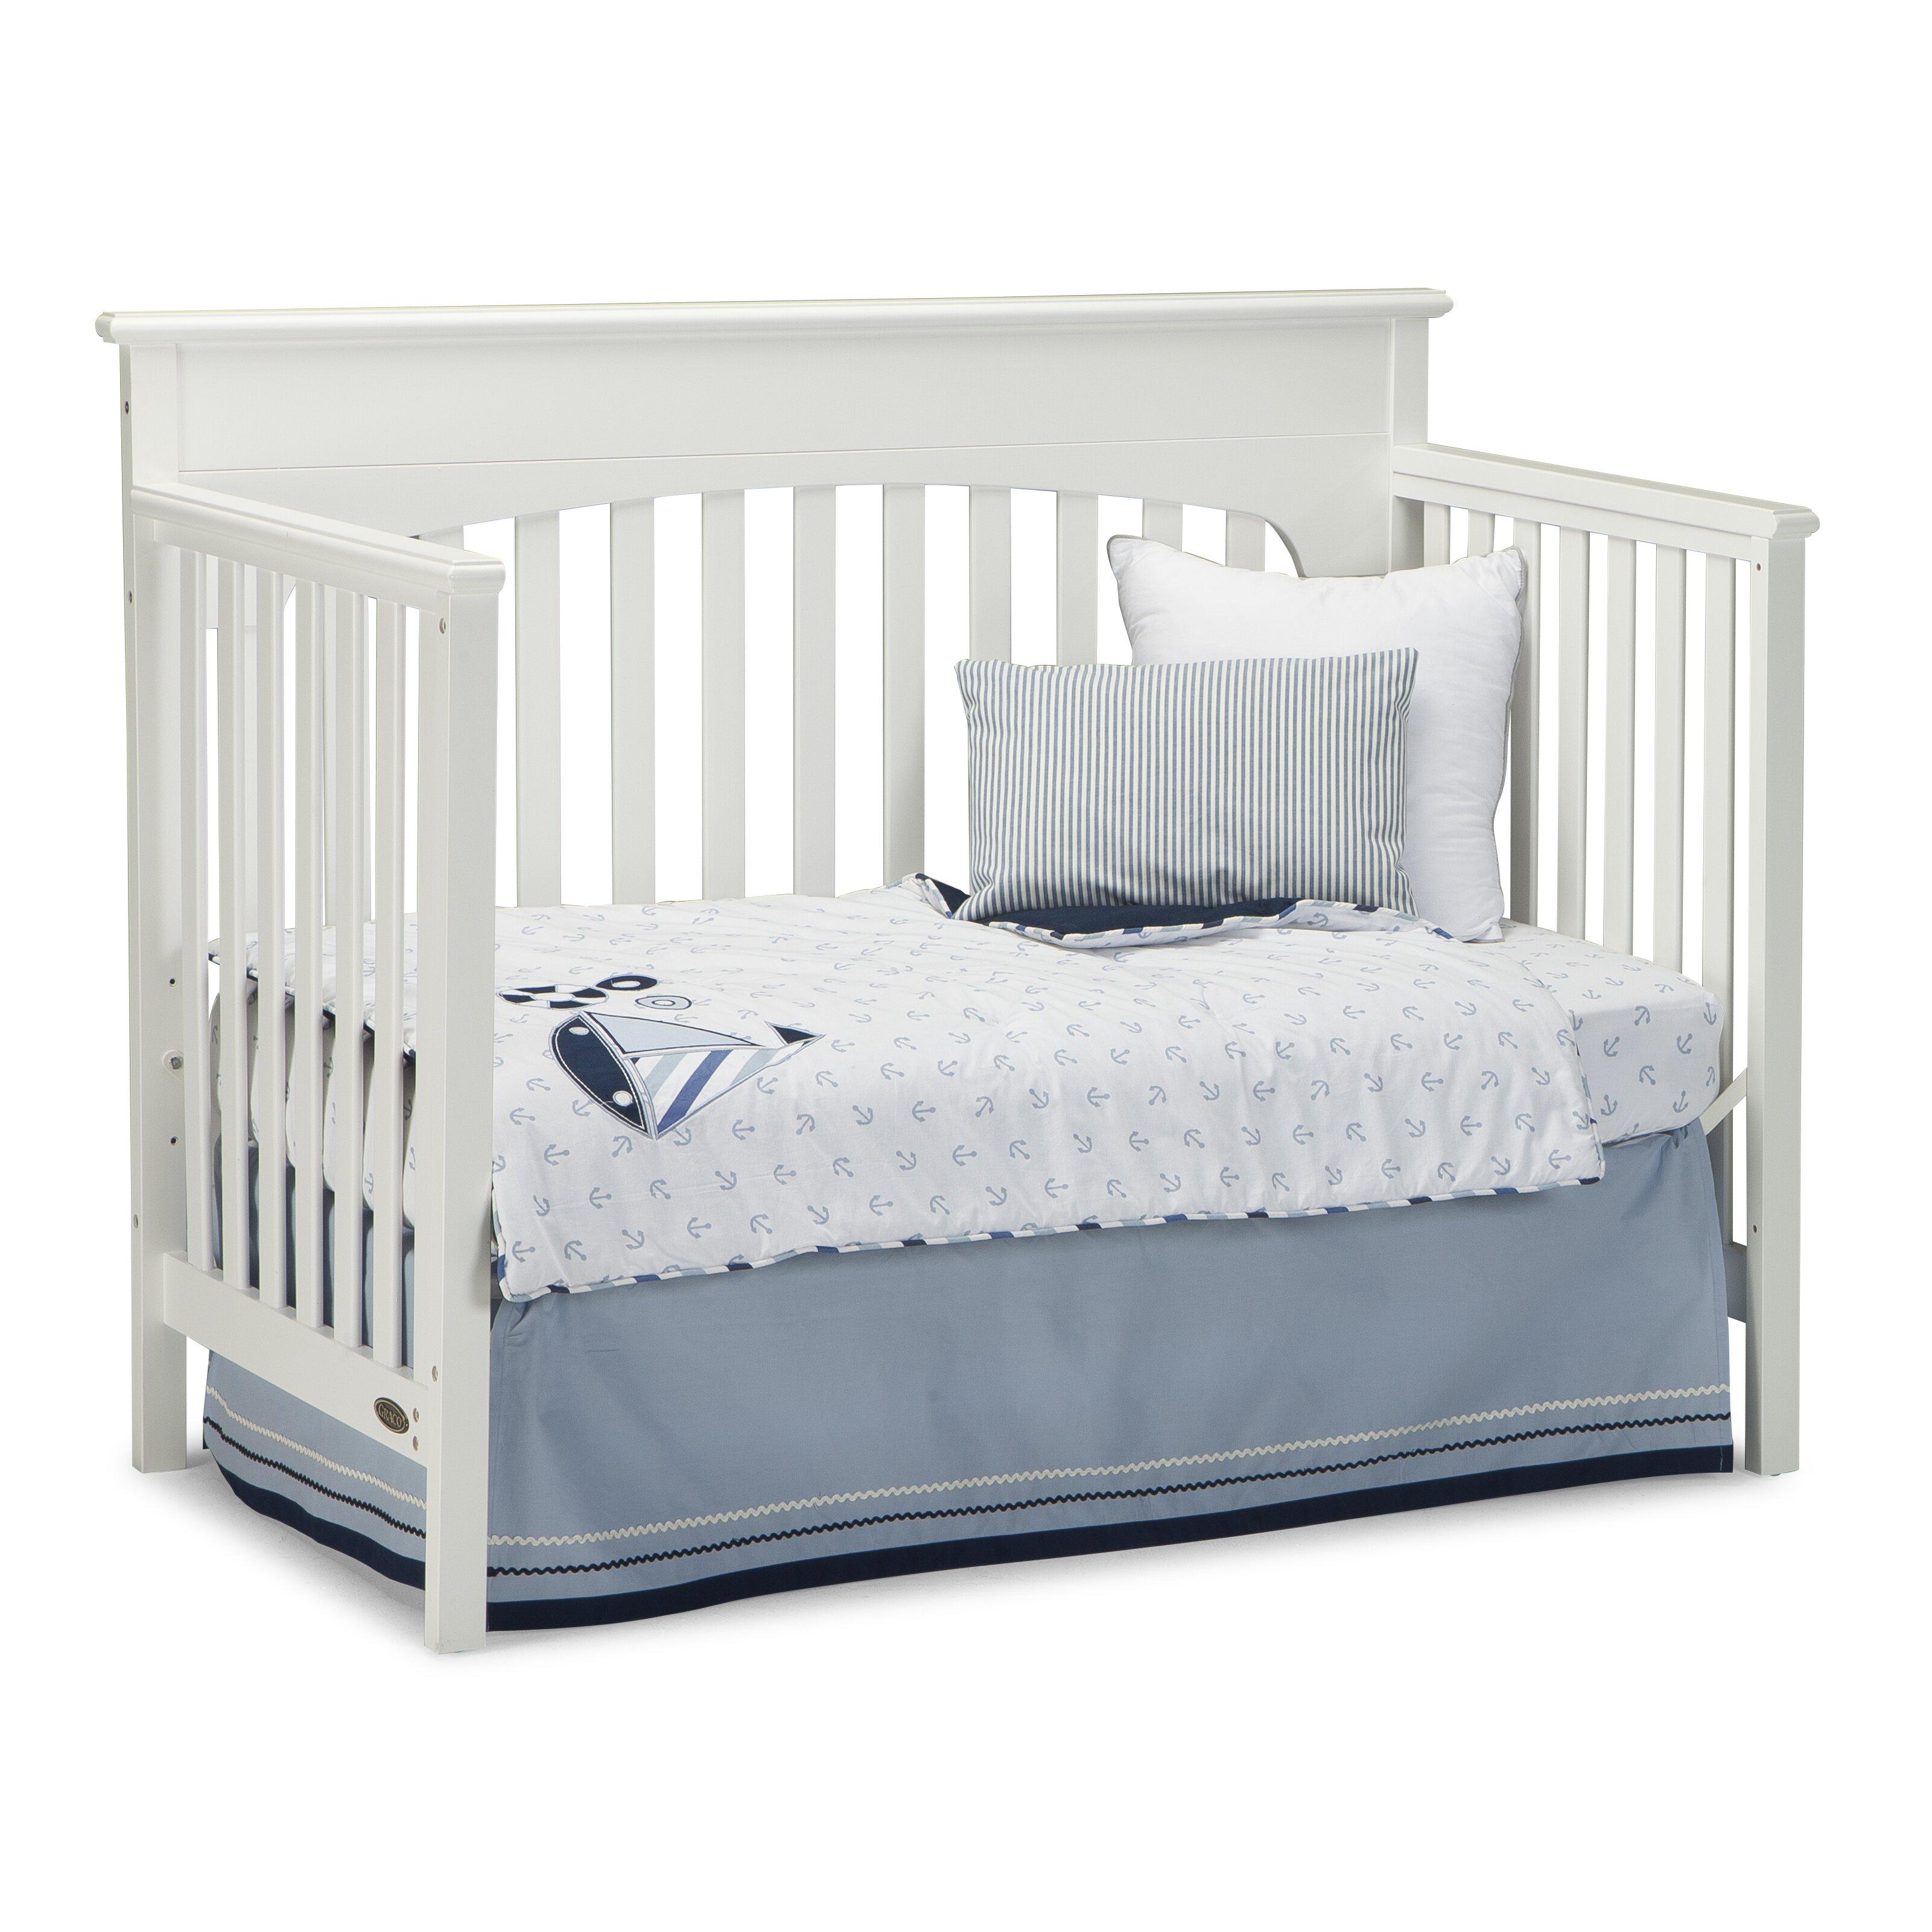 Graco crib for sale manila - Baby Cribs Graco Graco Lauren 4 In 1 Convertible Crib